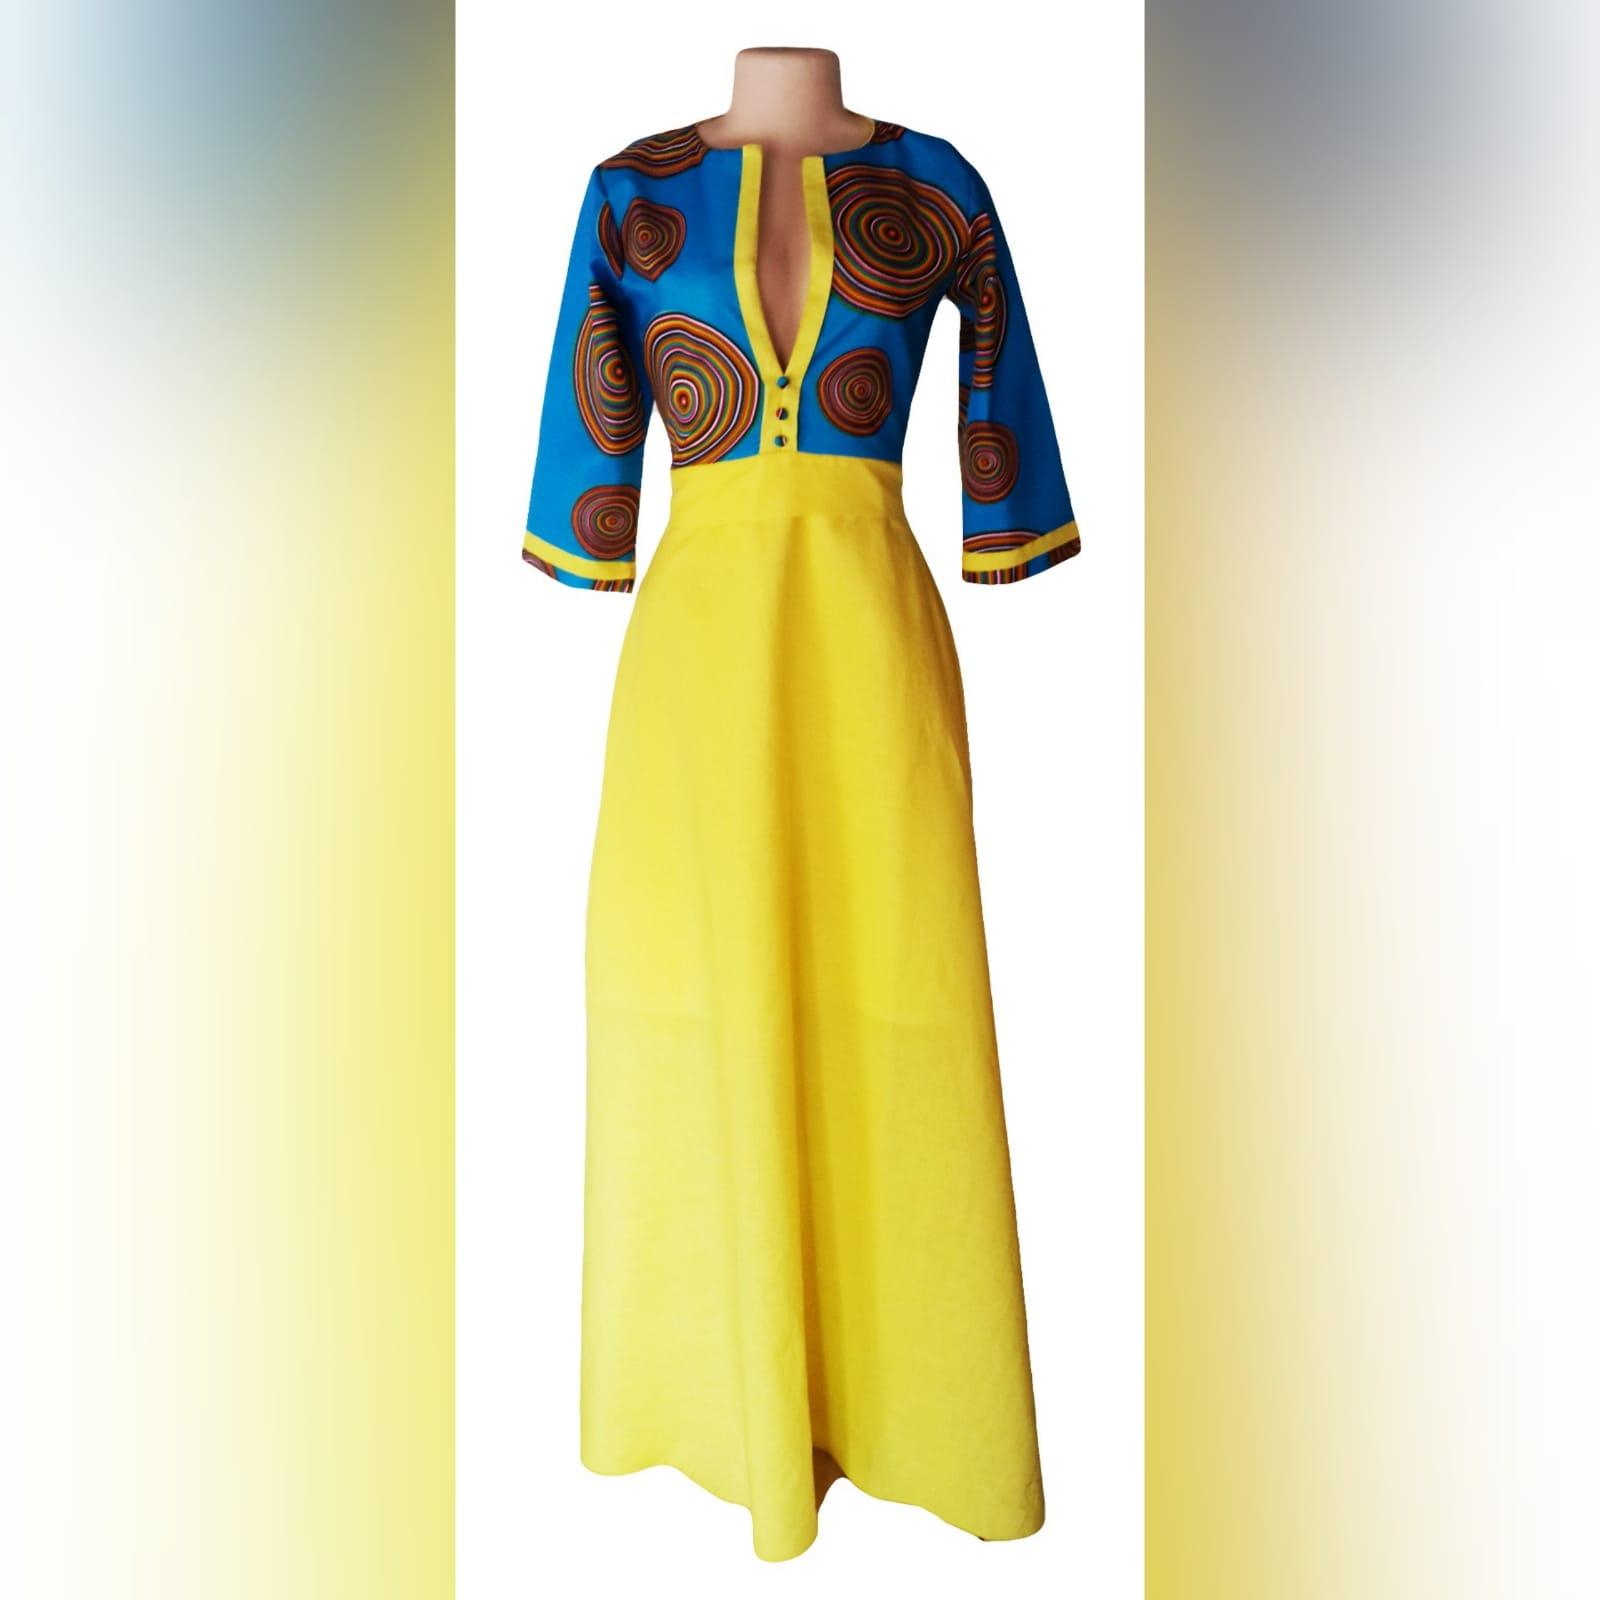 Blue & yellow modern traditional dress 8 modern traditional blue and yellow empire fit dress. Flowy bottom, neckline with a slit.